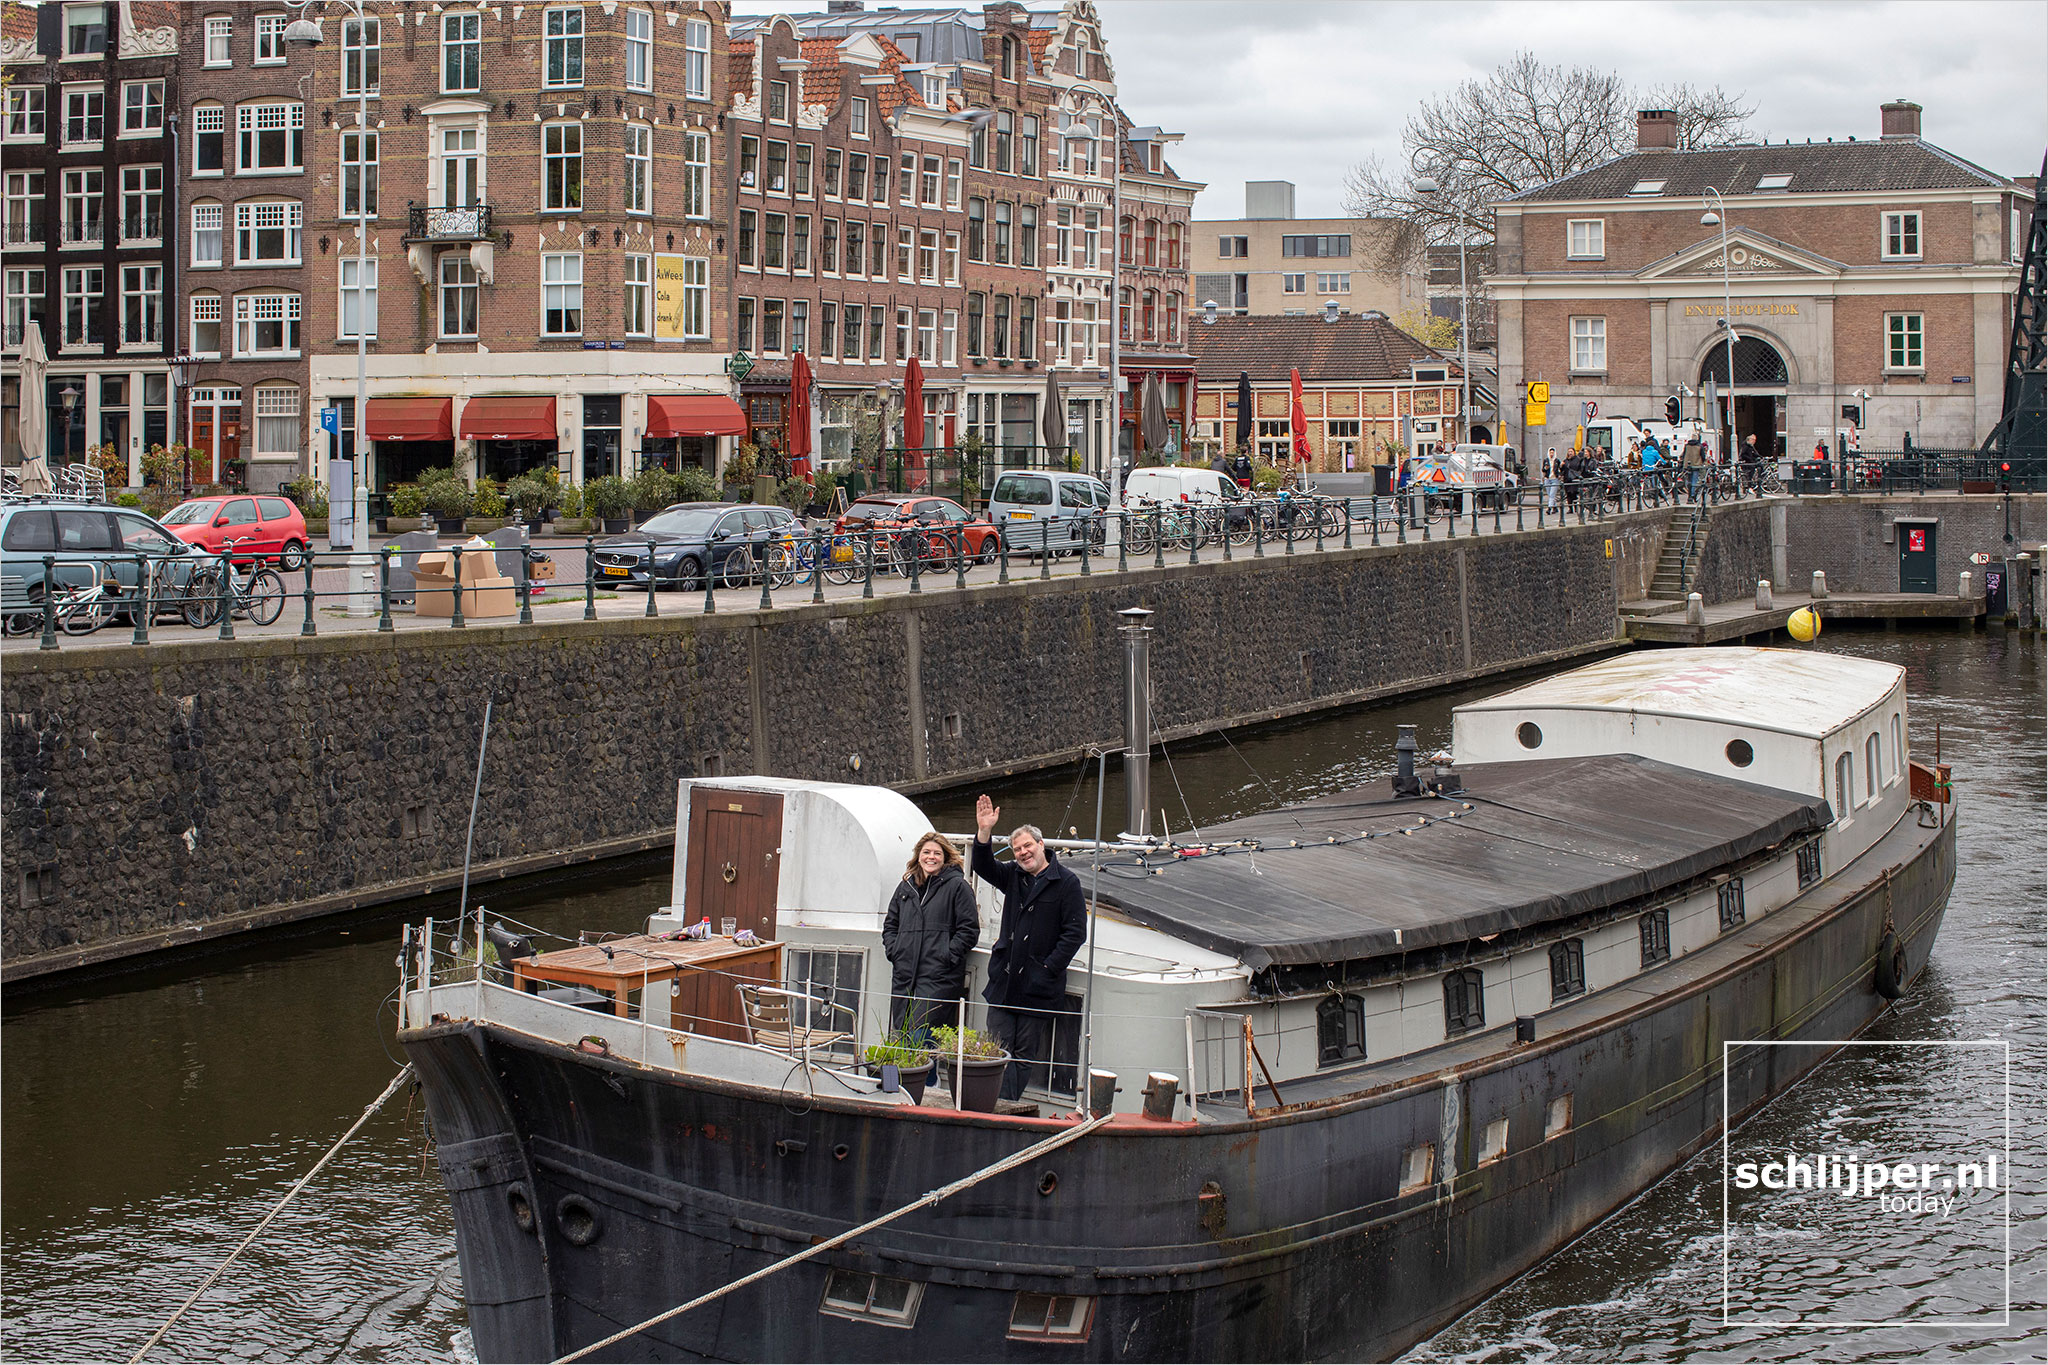 The Netherlands, Amsterdam, 25 april 2021